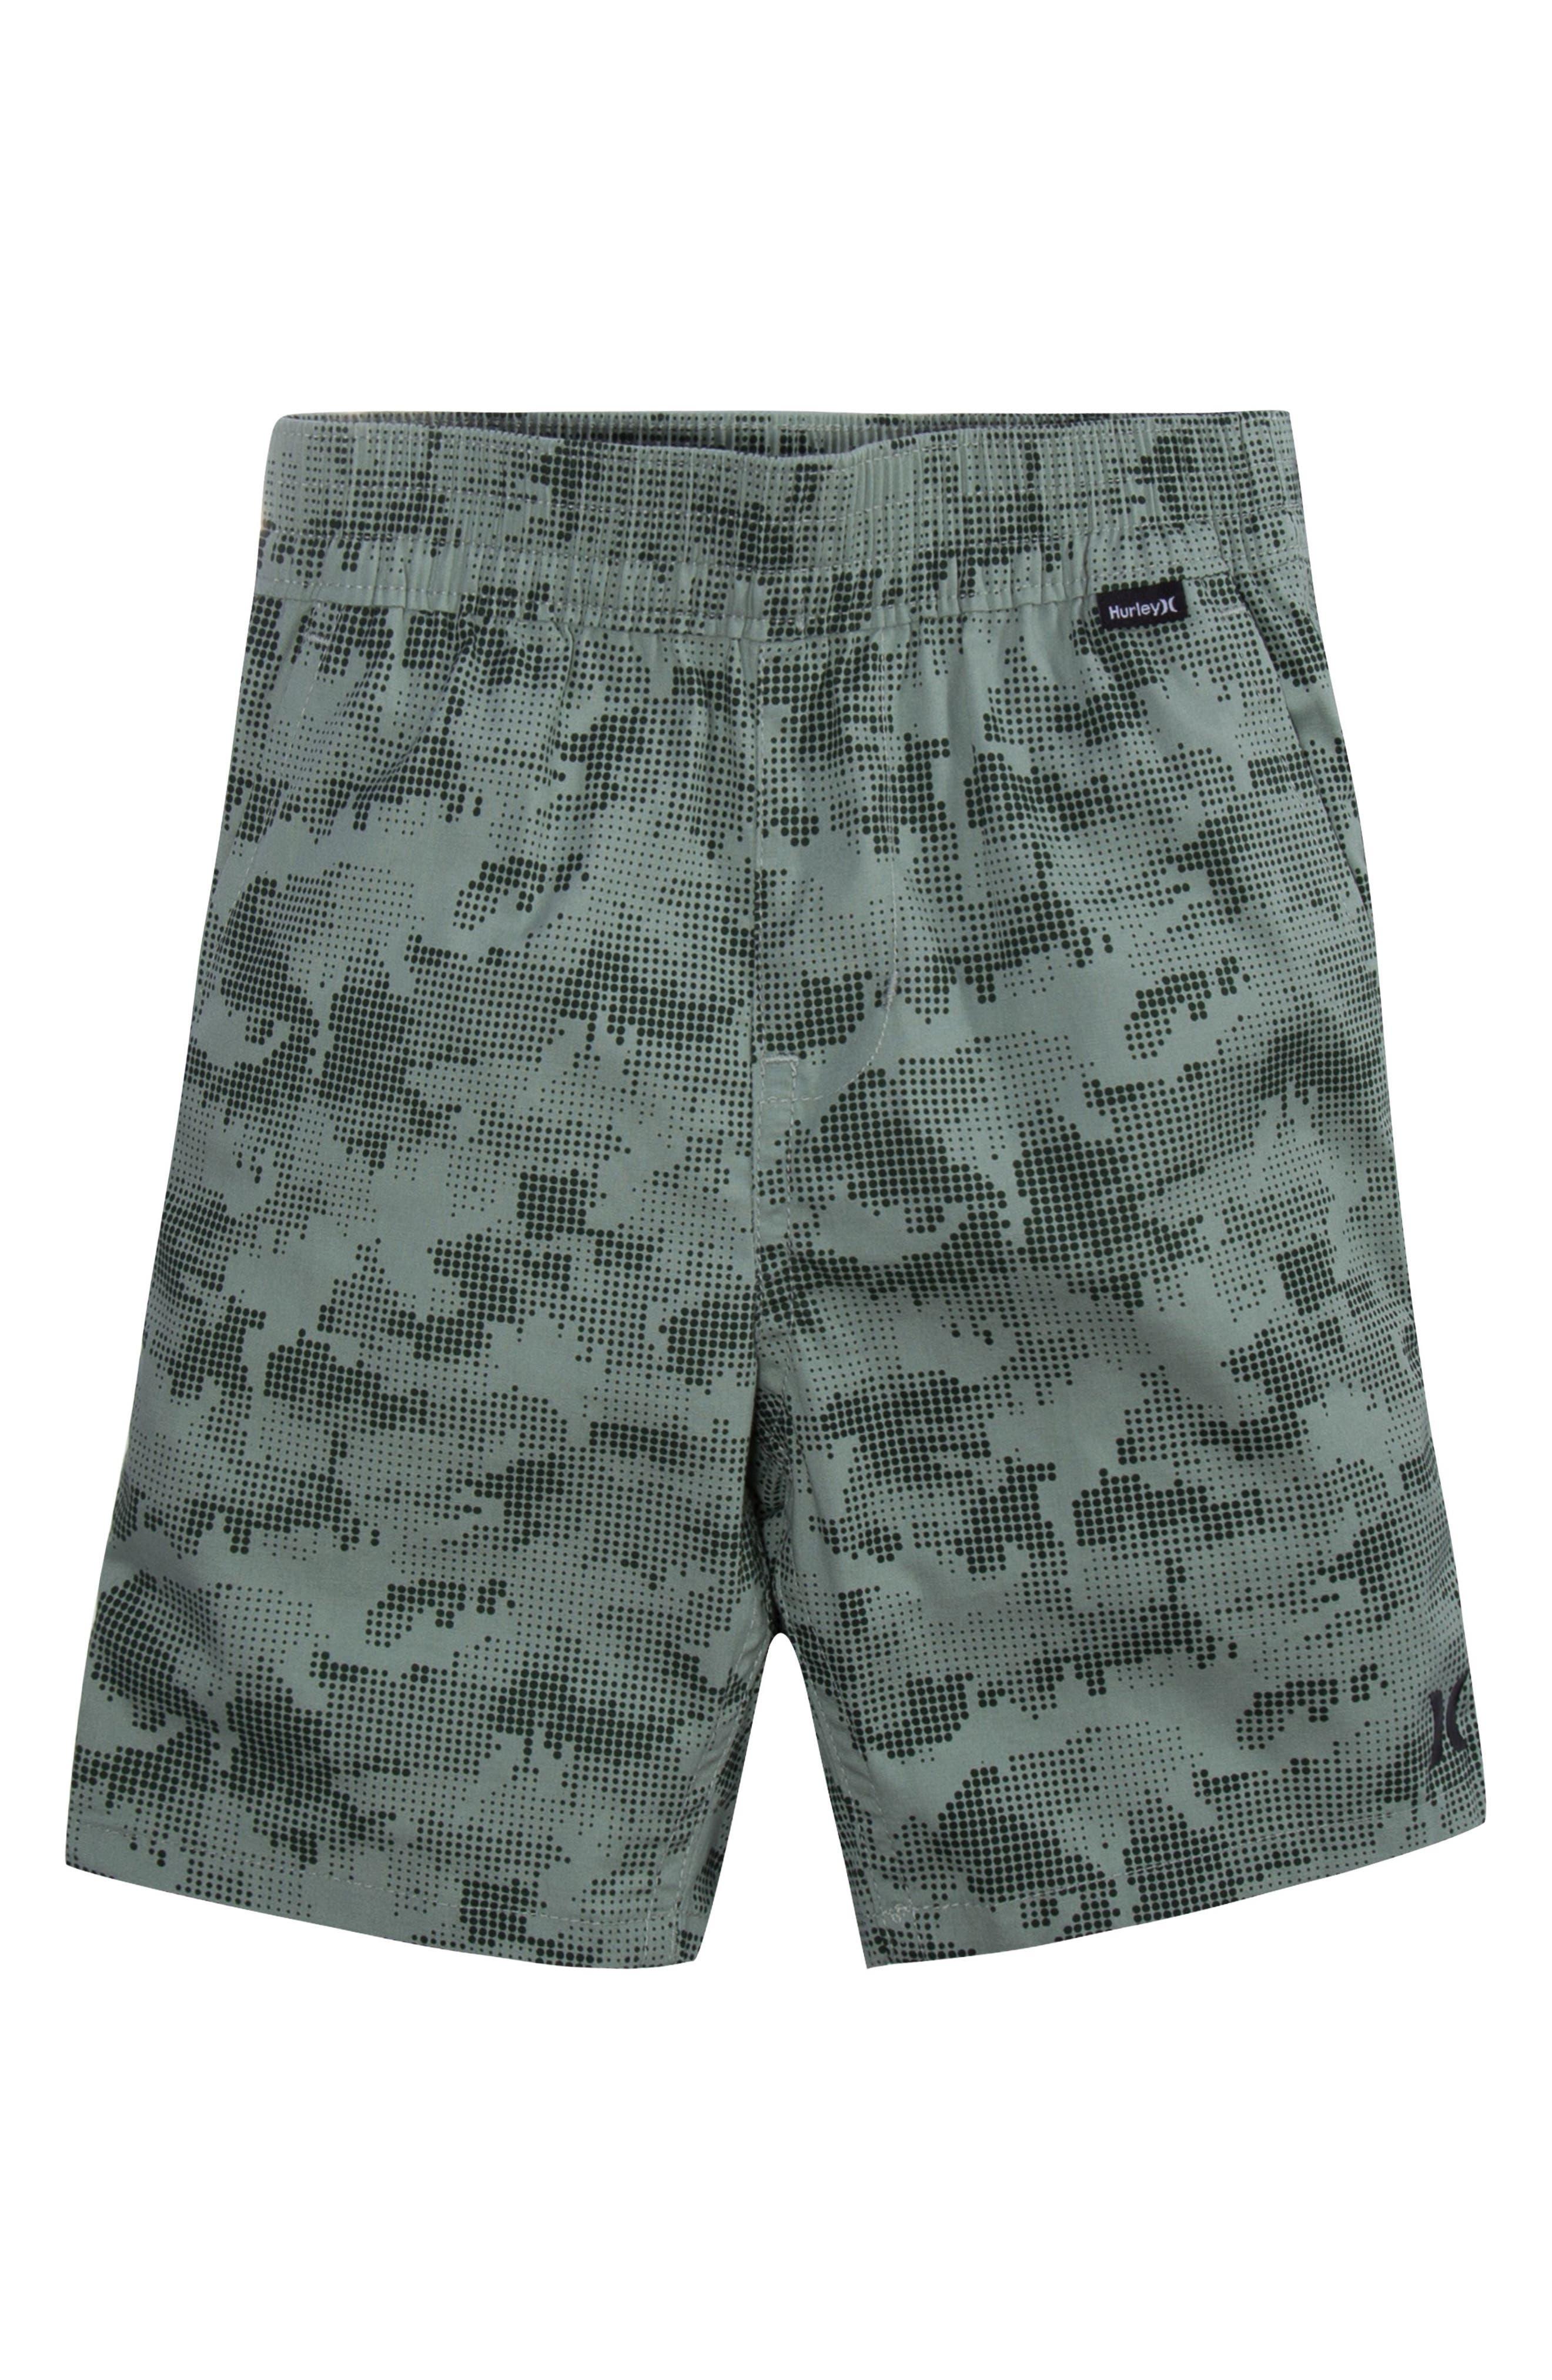 Poplin Pull-On Shorts,                             Main thumbnail 1, color,                             Clay Green